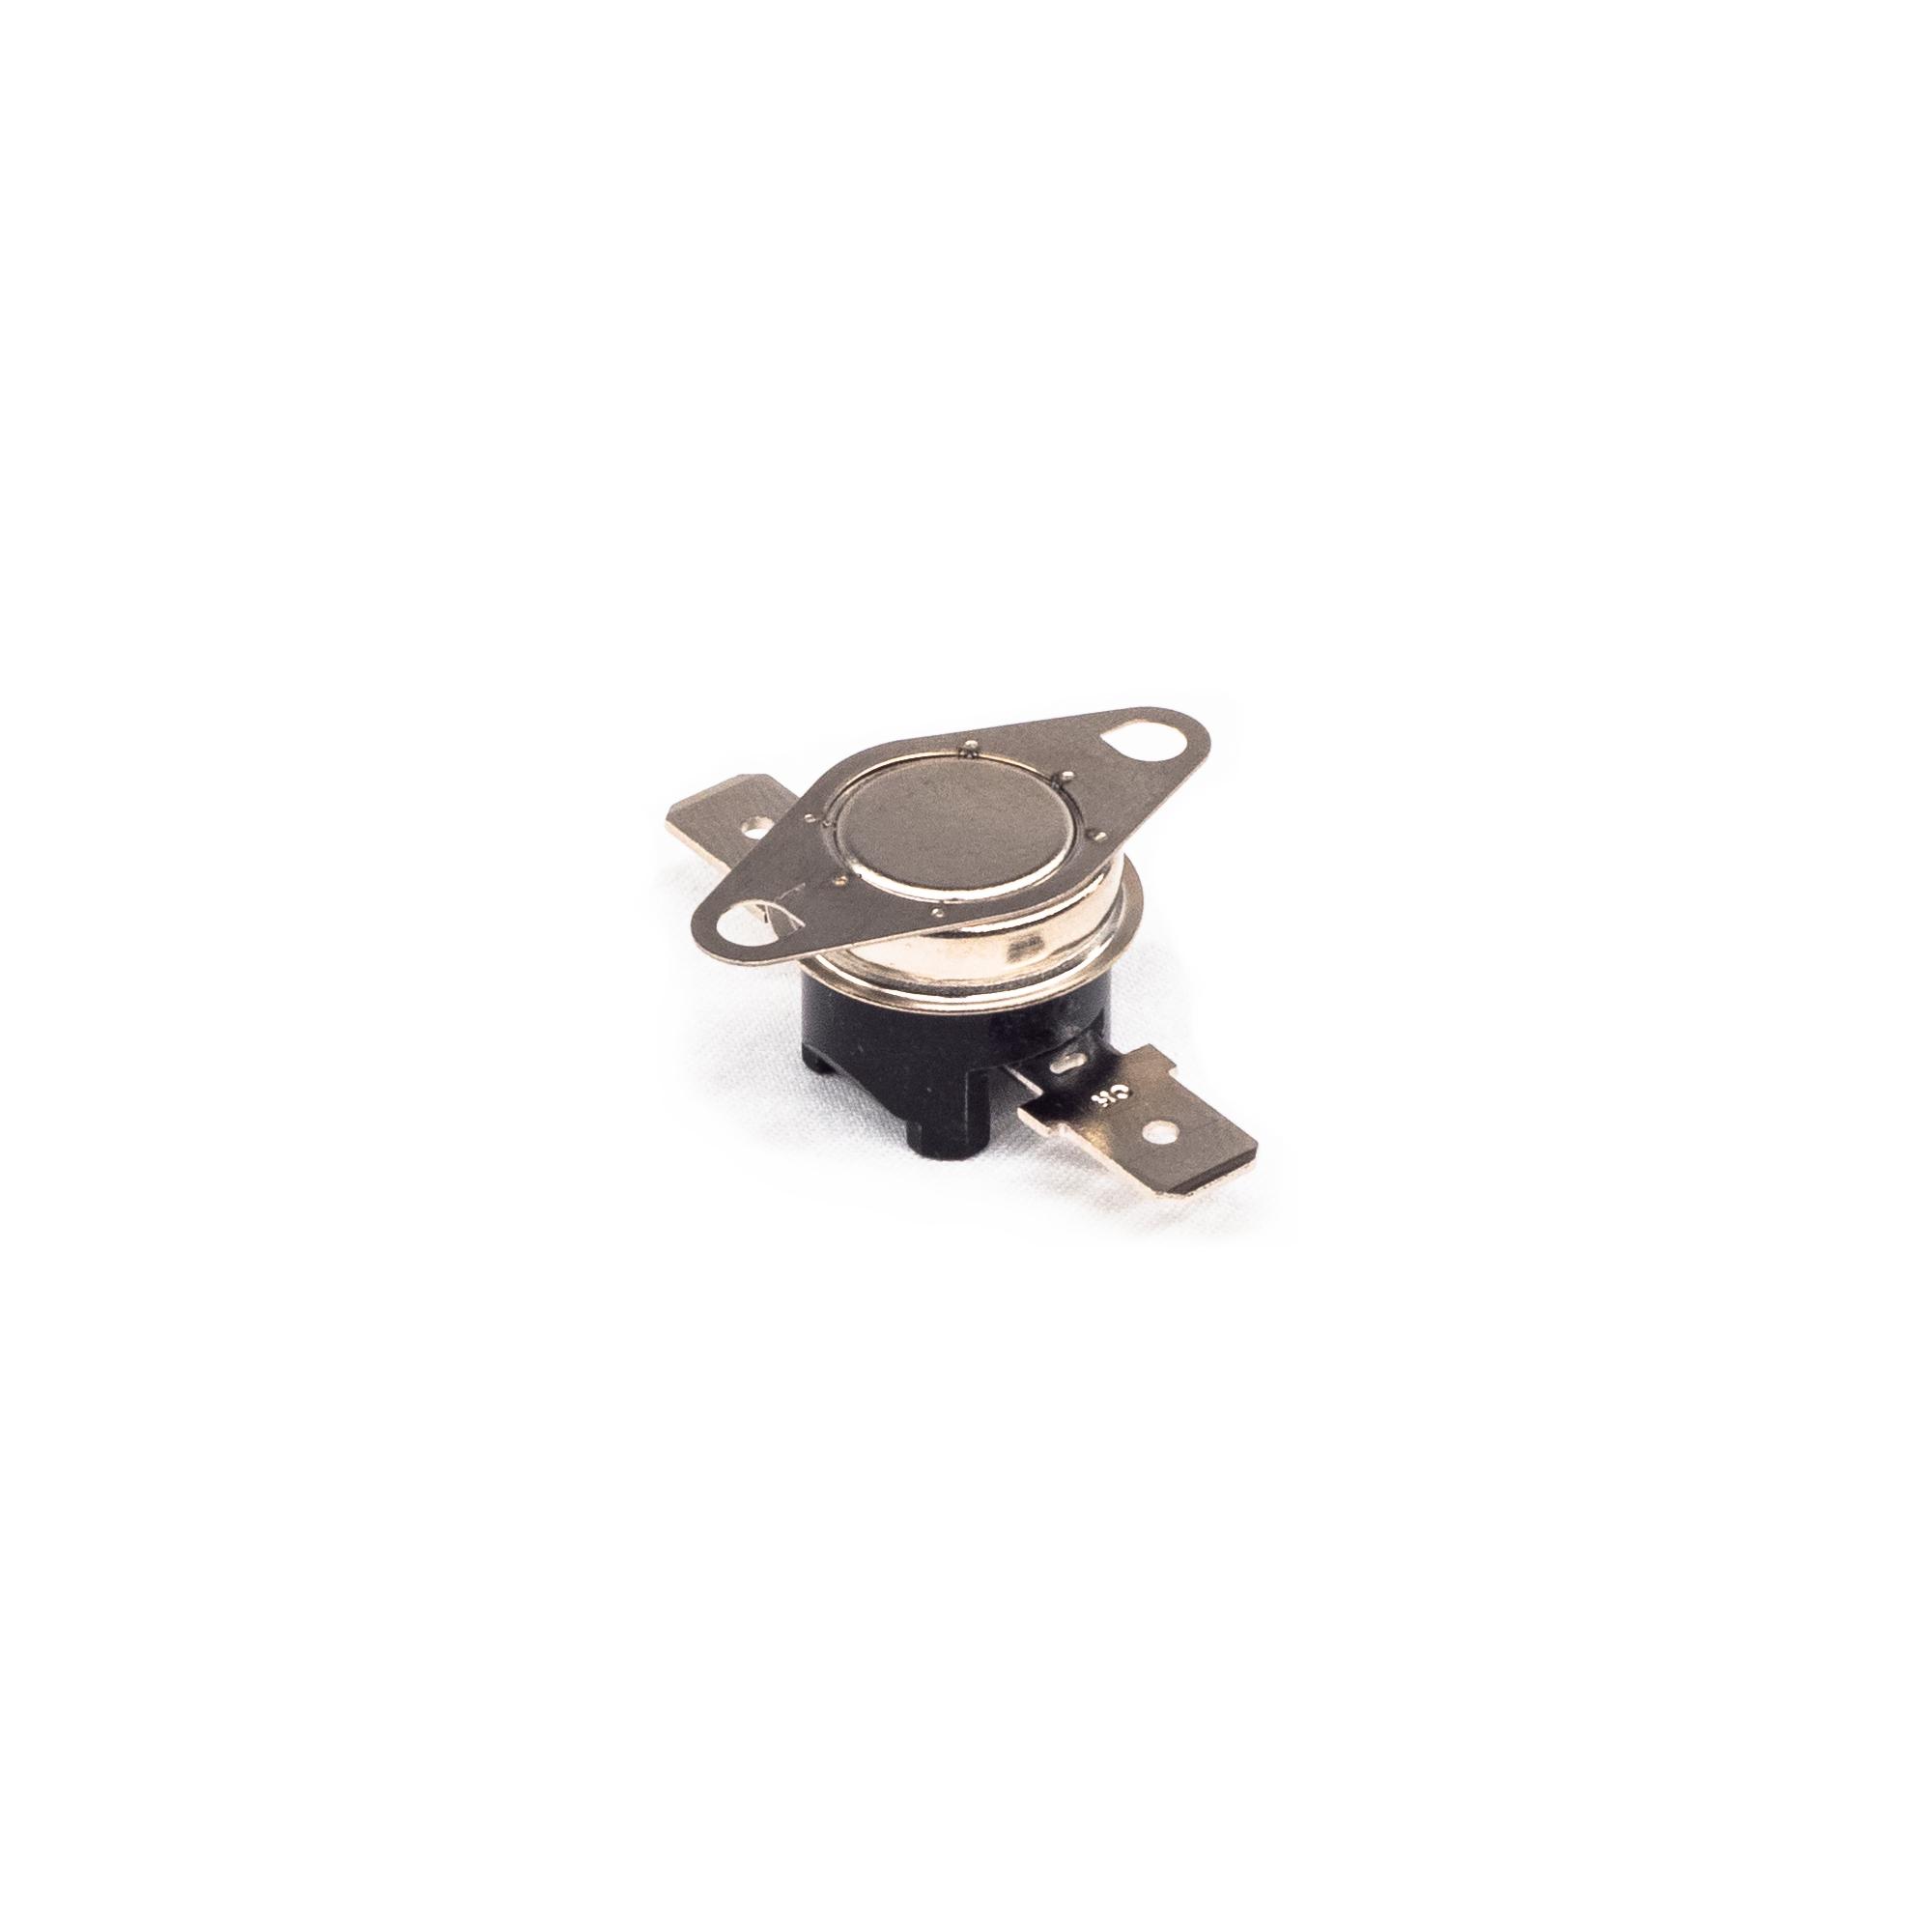 Automatic T-Stat Snap Sensor for BLOT (SRV26D2870)